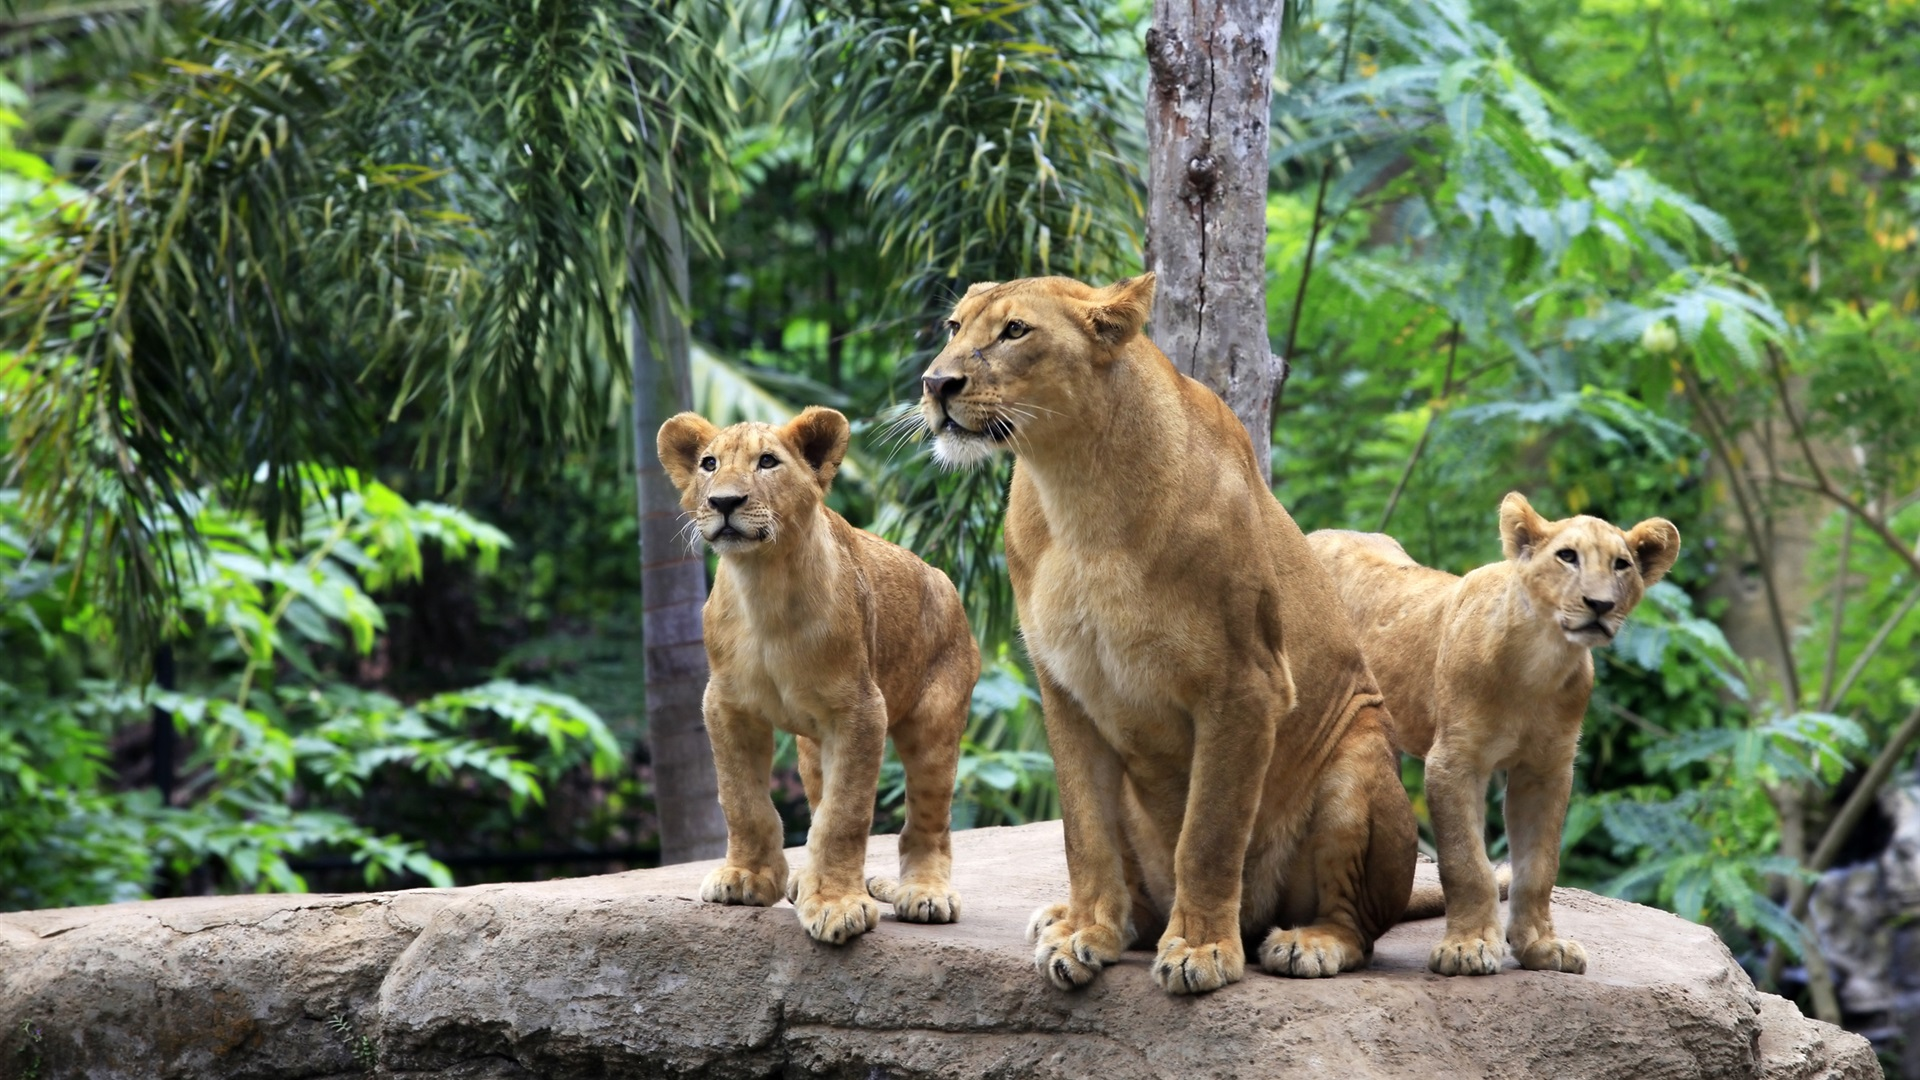 Lion family wallpaper - photo#38